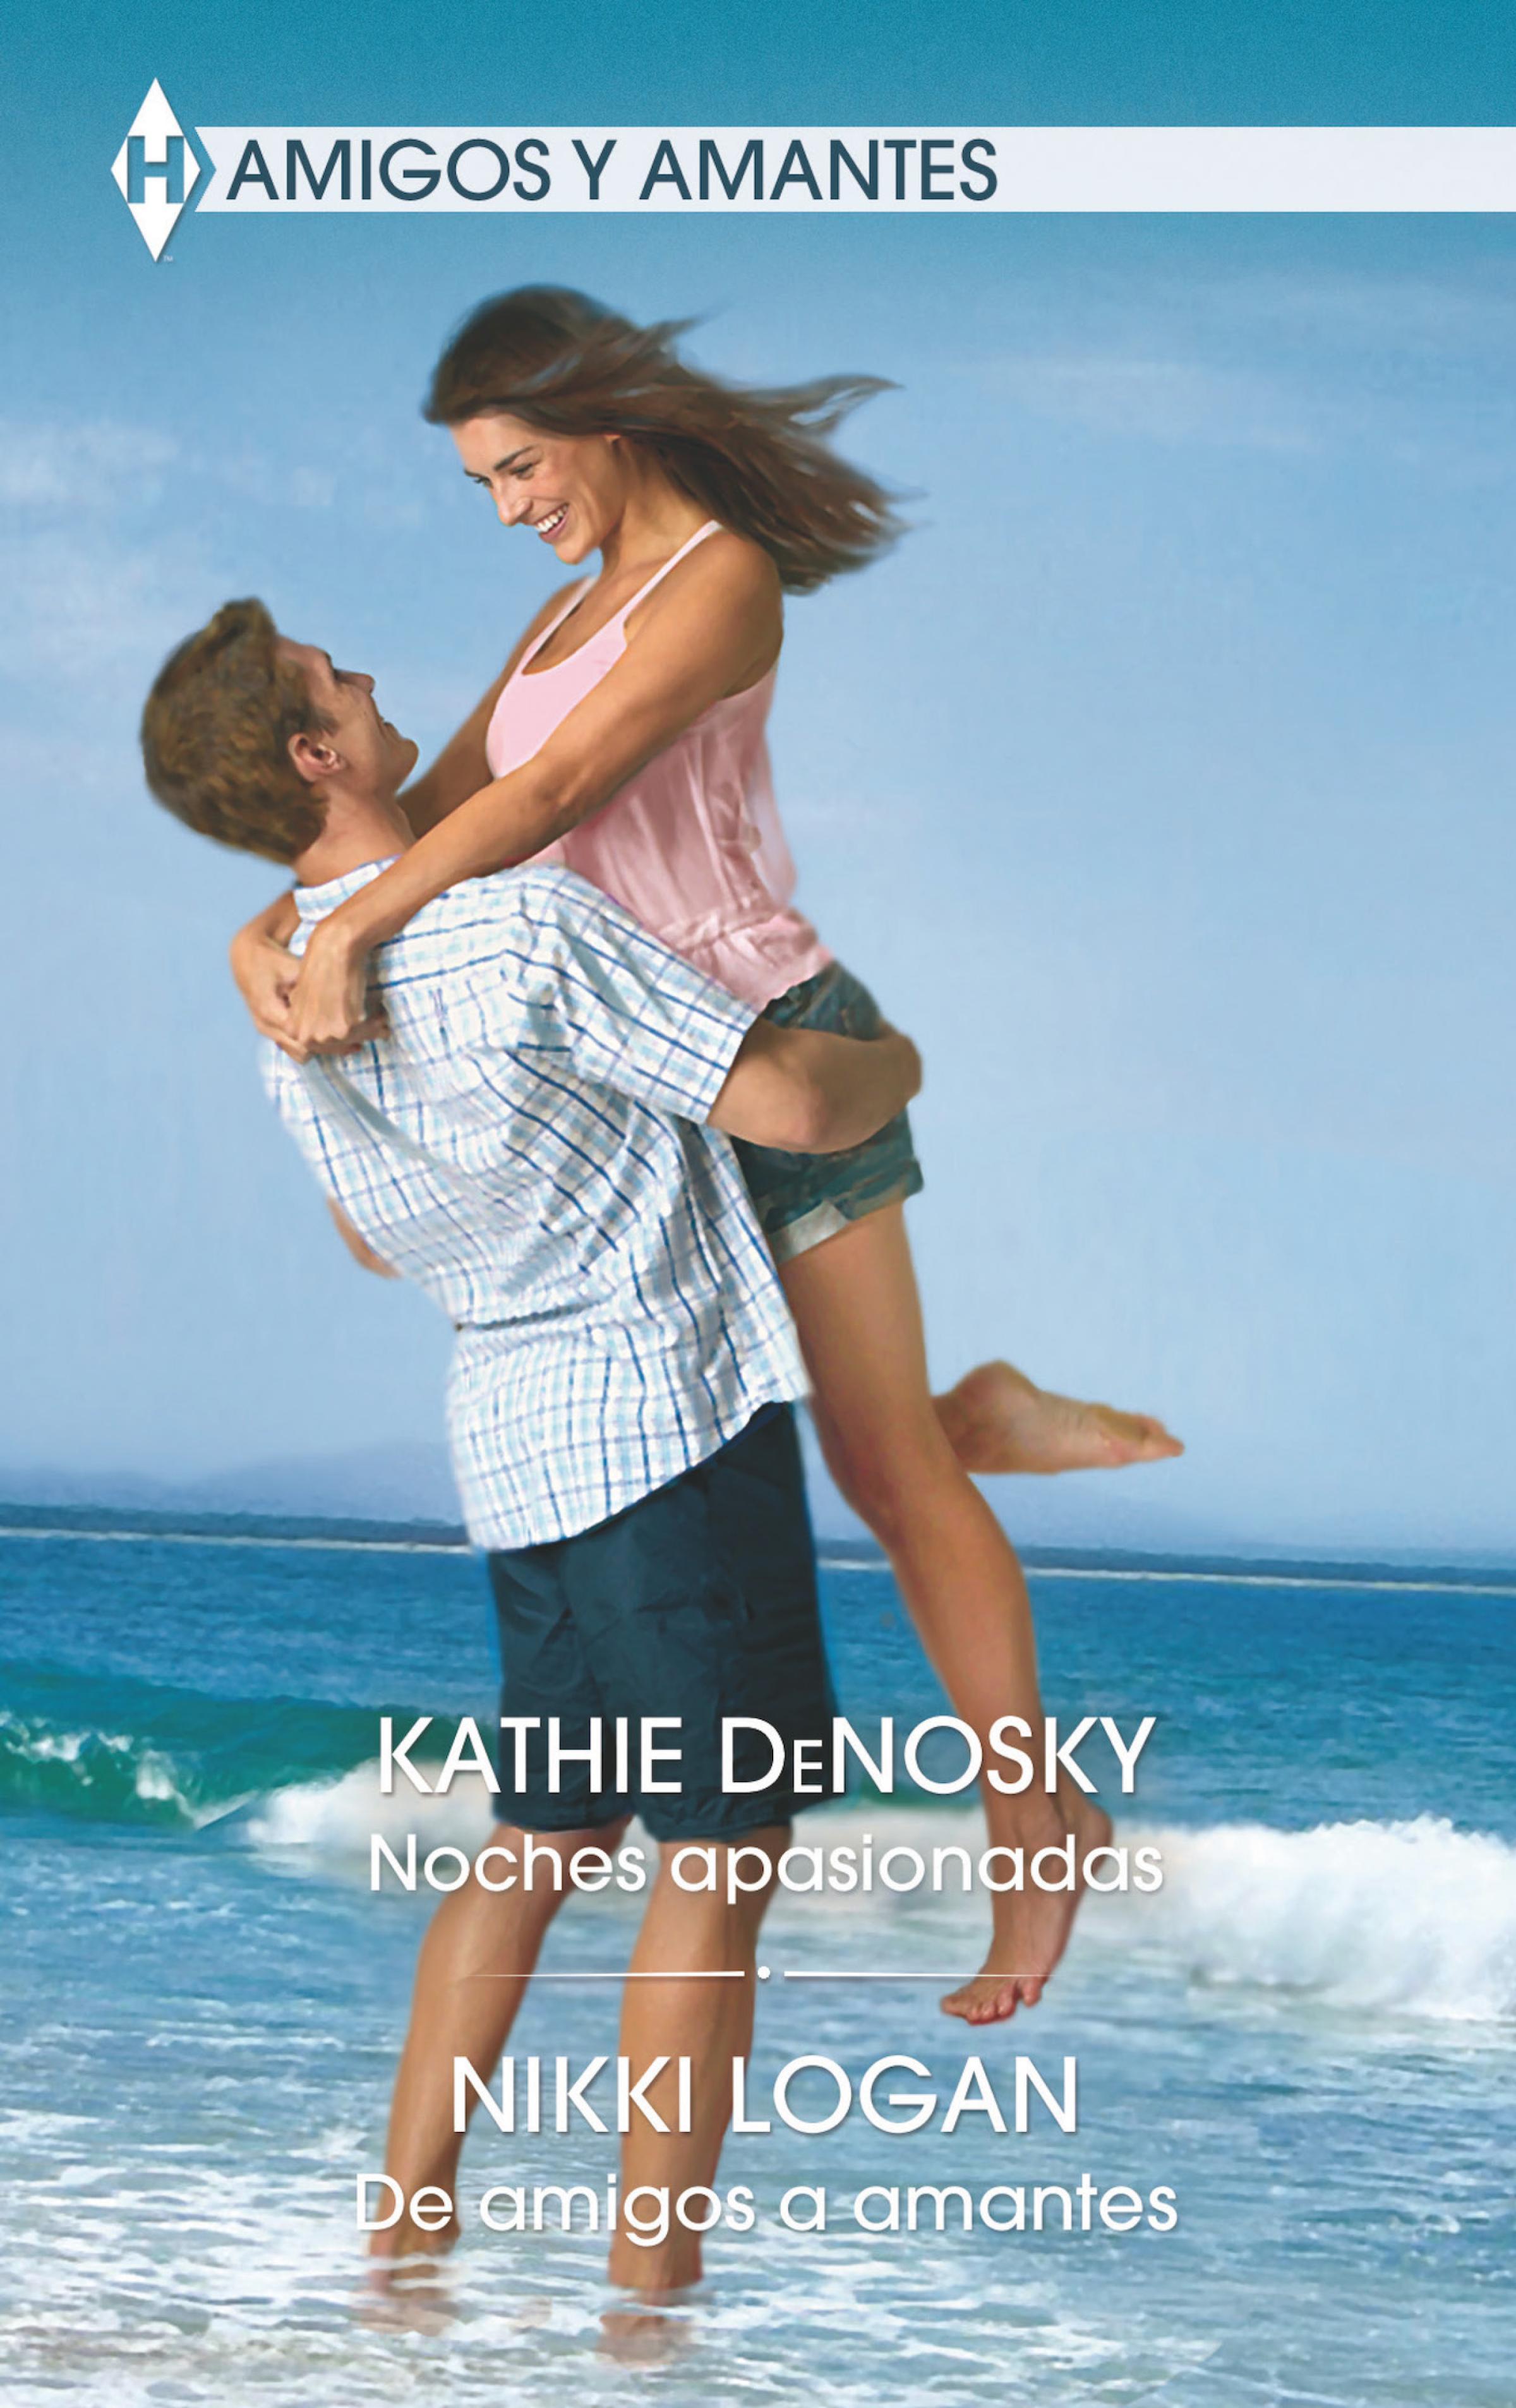 Kathie DeNosky Noches apasionadas - De amigos a amantes недорого